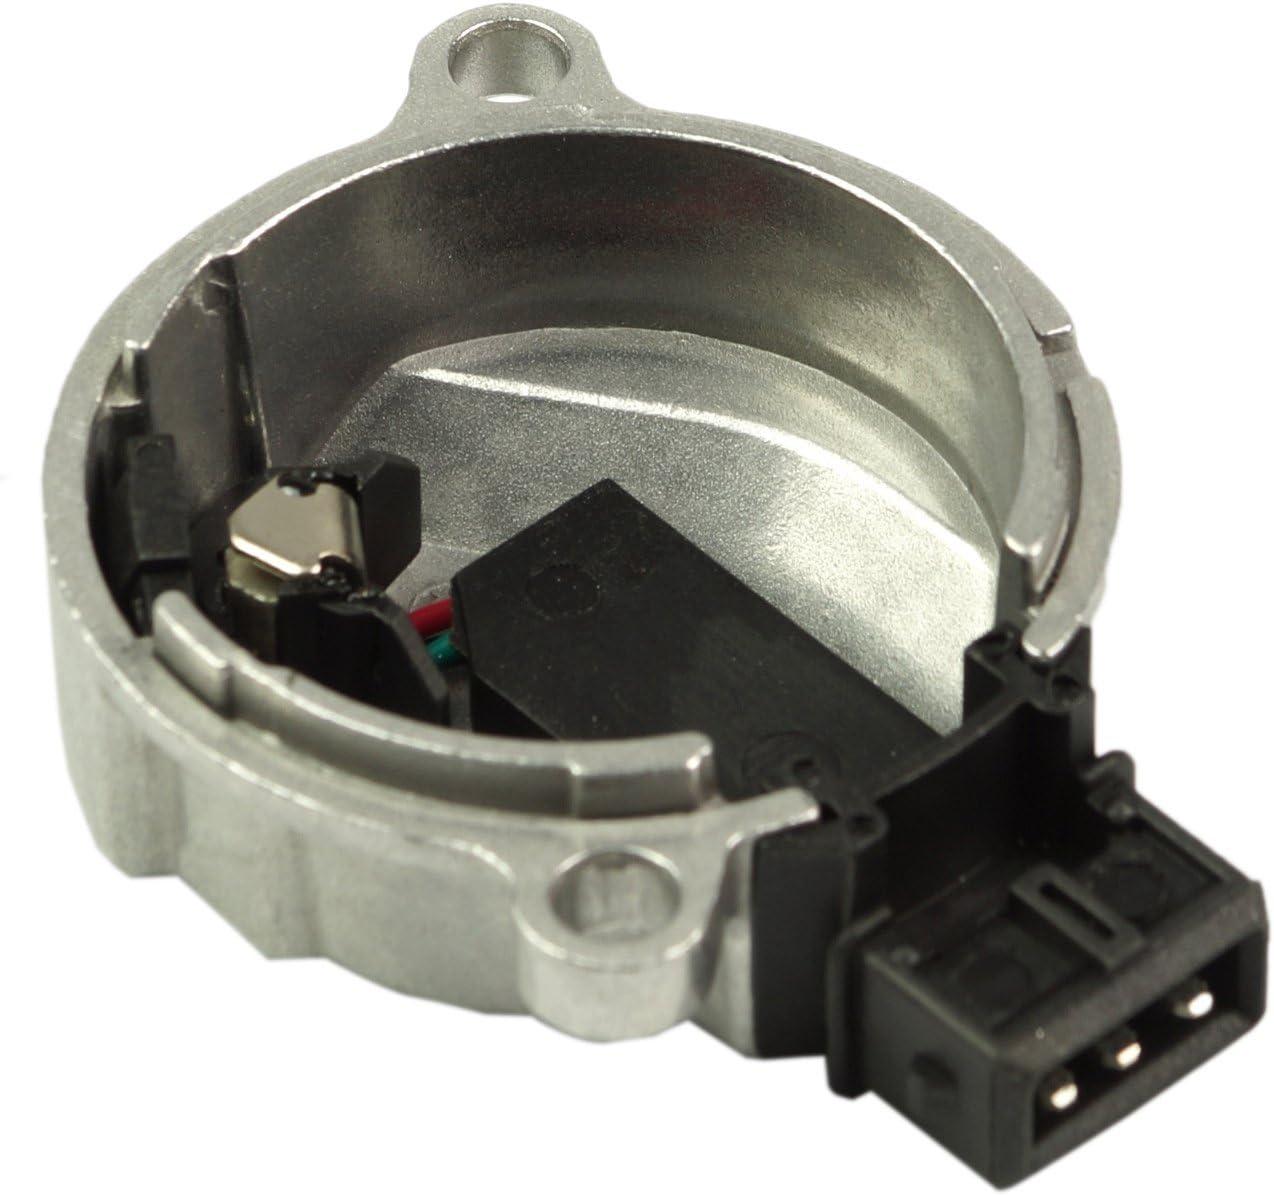 Bapmic 058905161B Special sale item PC345 Camshaft Position Volkswagen Sensor Popular product for